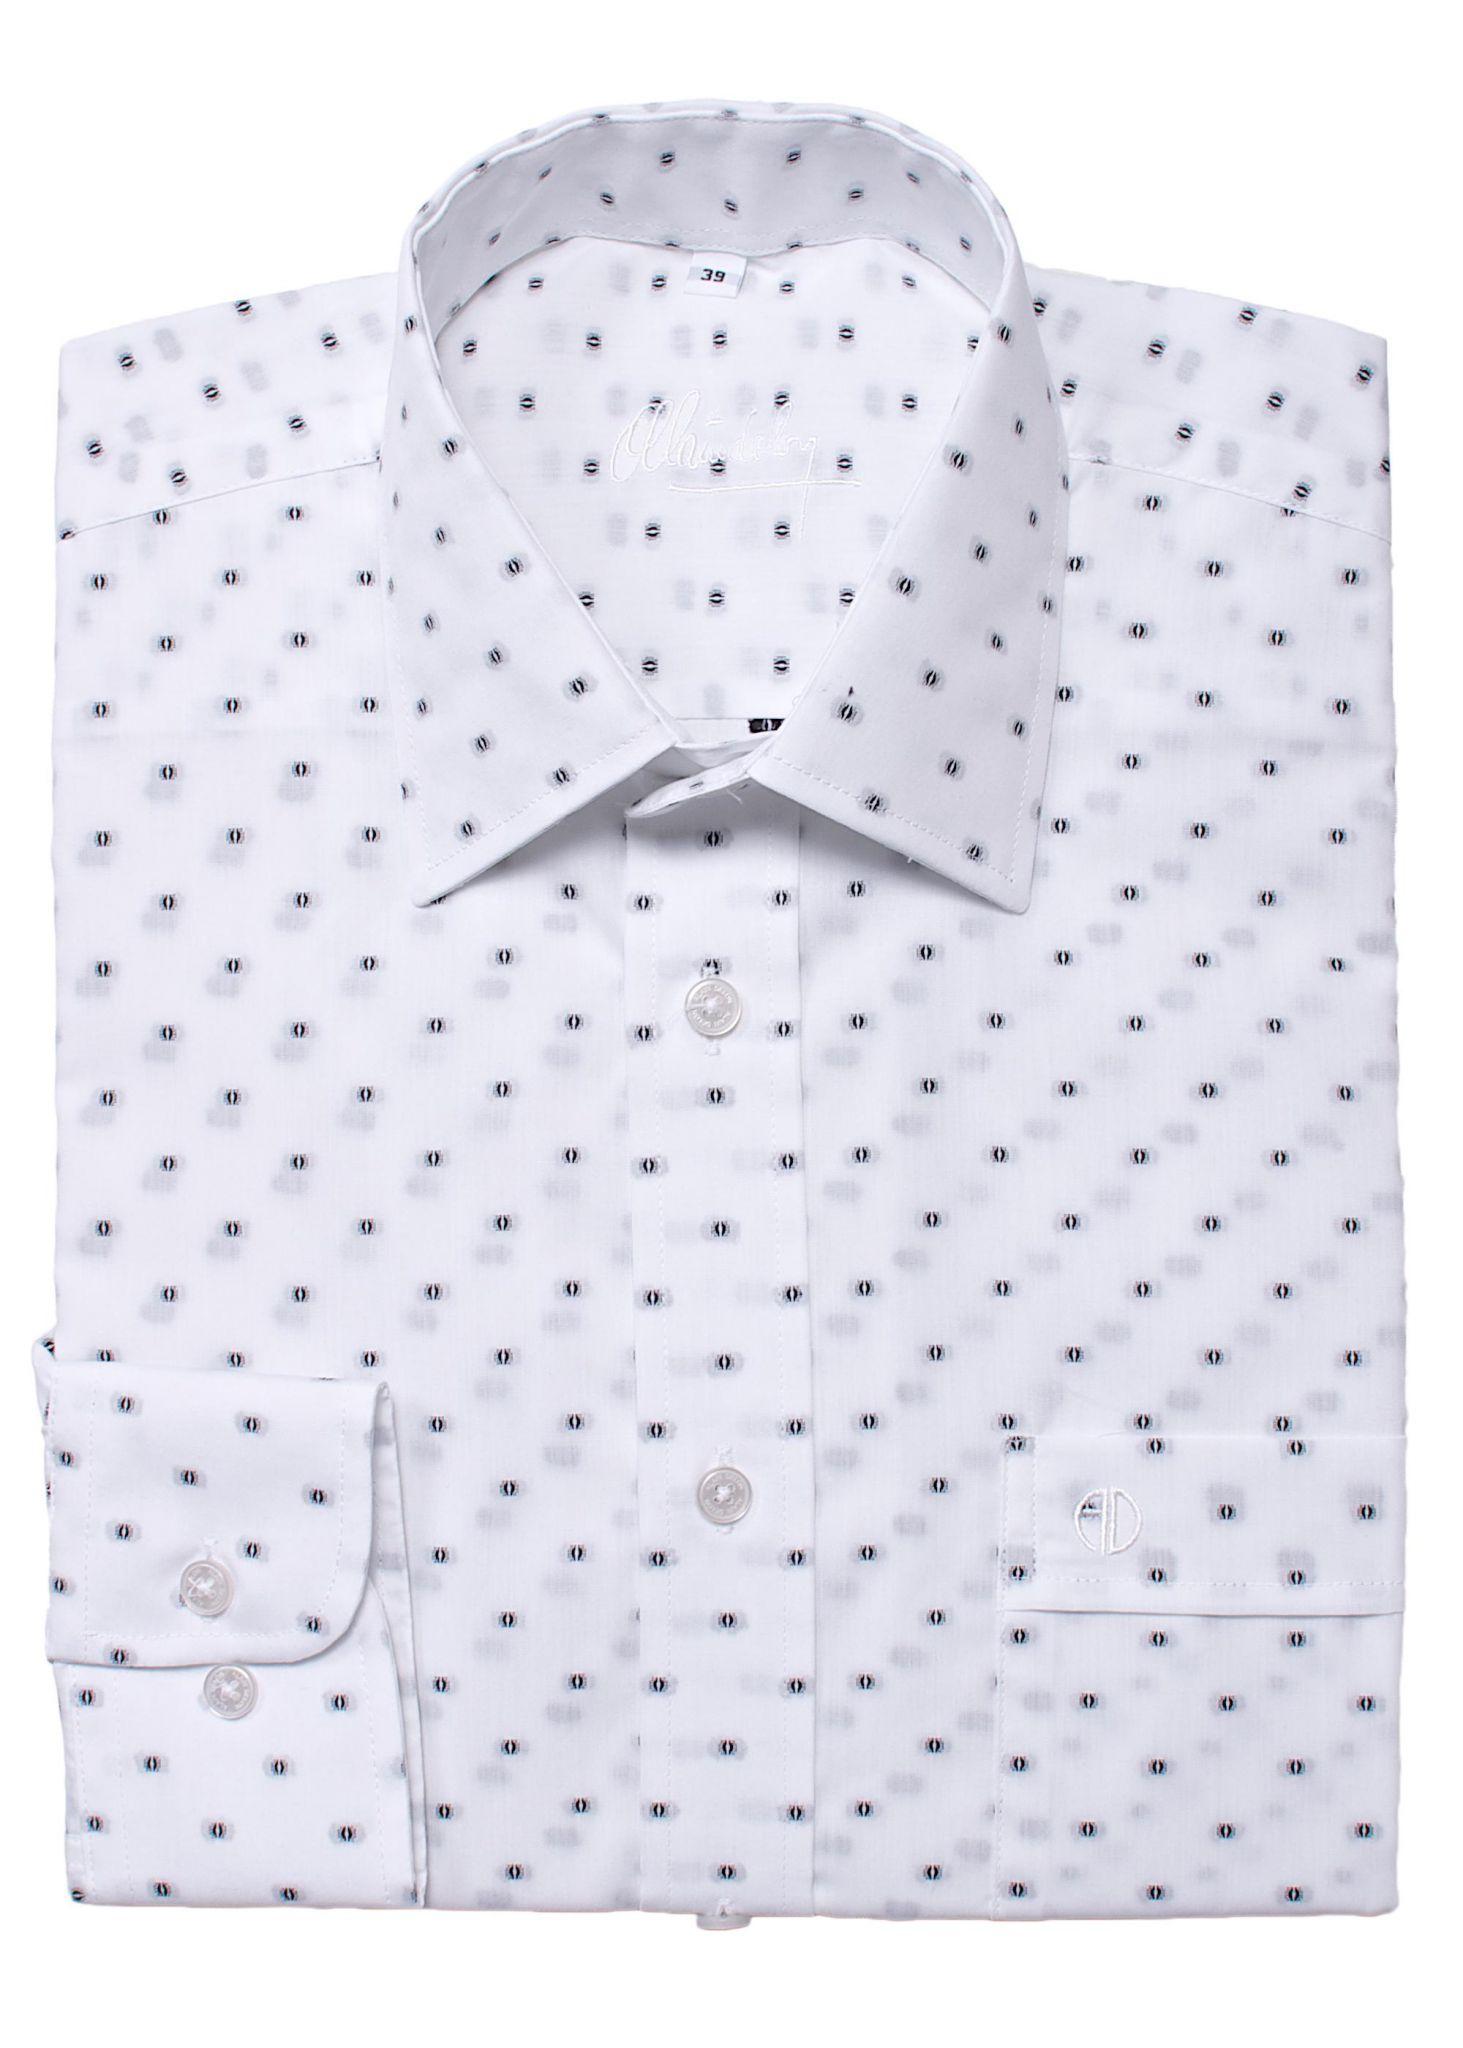 White Classic Fit patterned shirt - Shirts - E-shop | alaindelon.co.uk